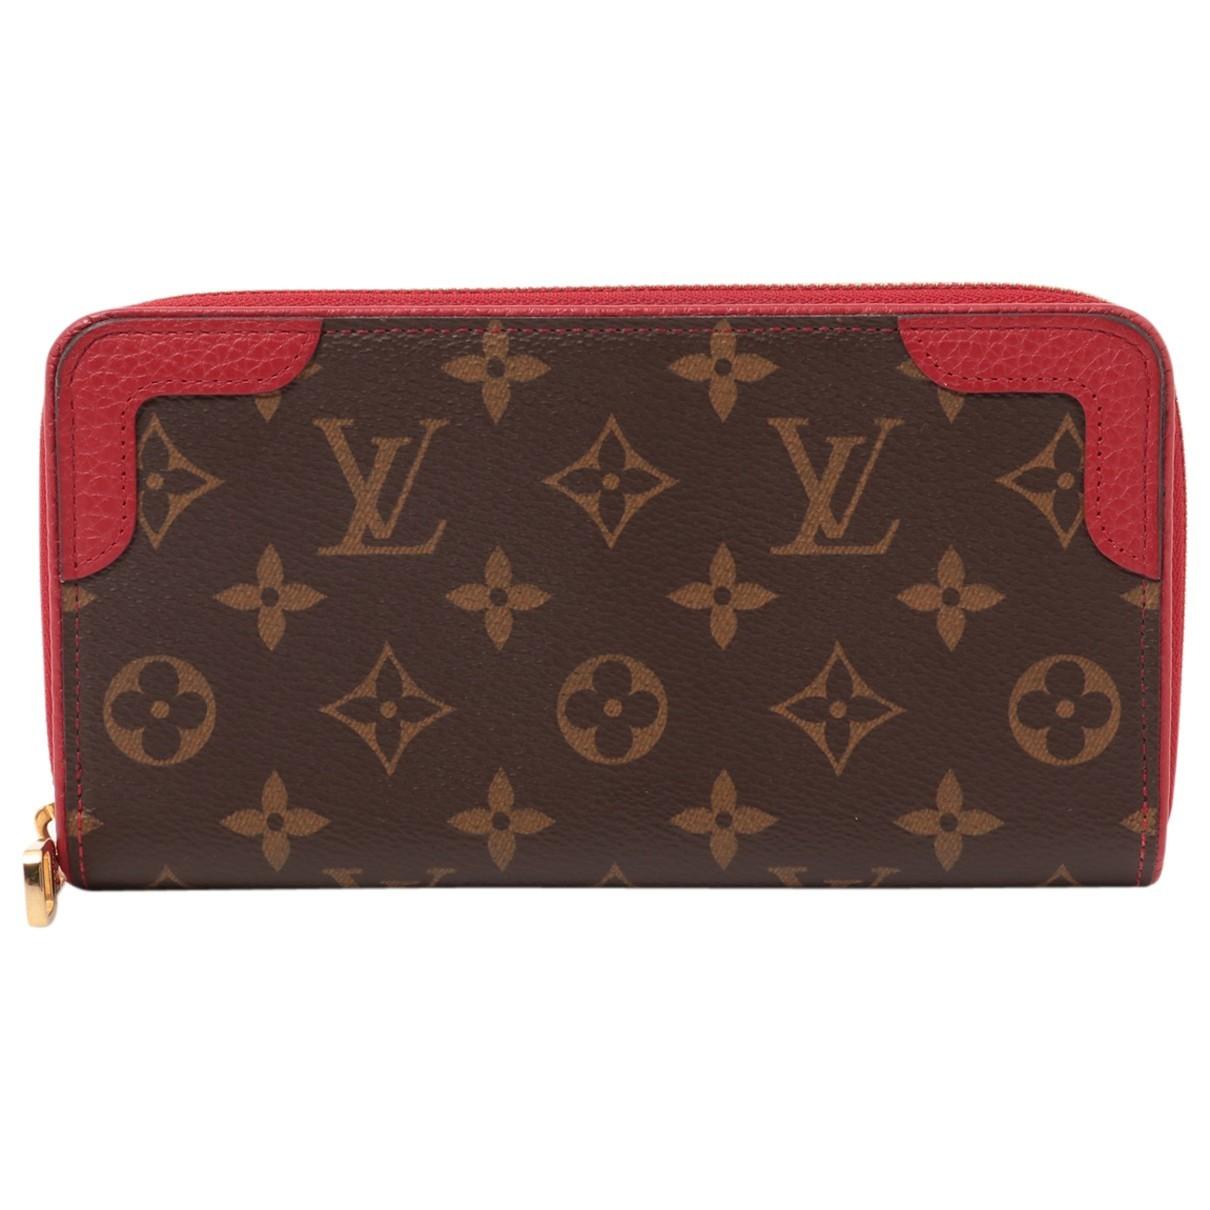 Louis Vuitton N Cloth wallet for Women N